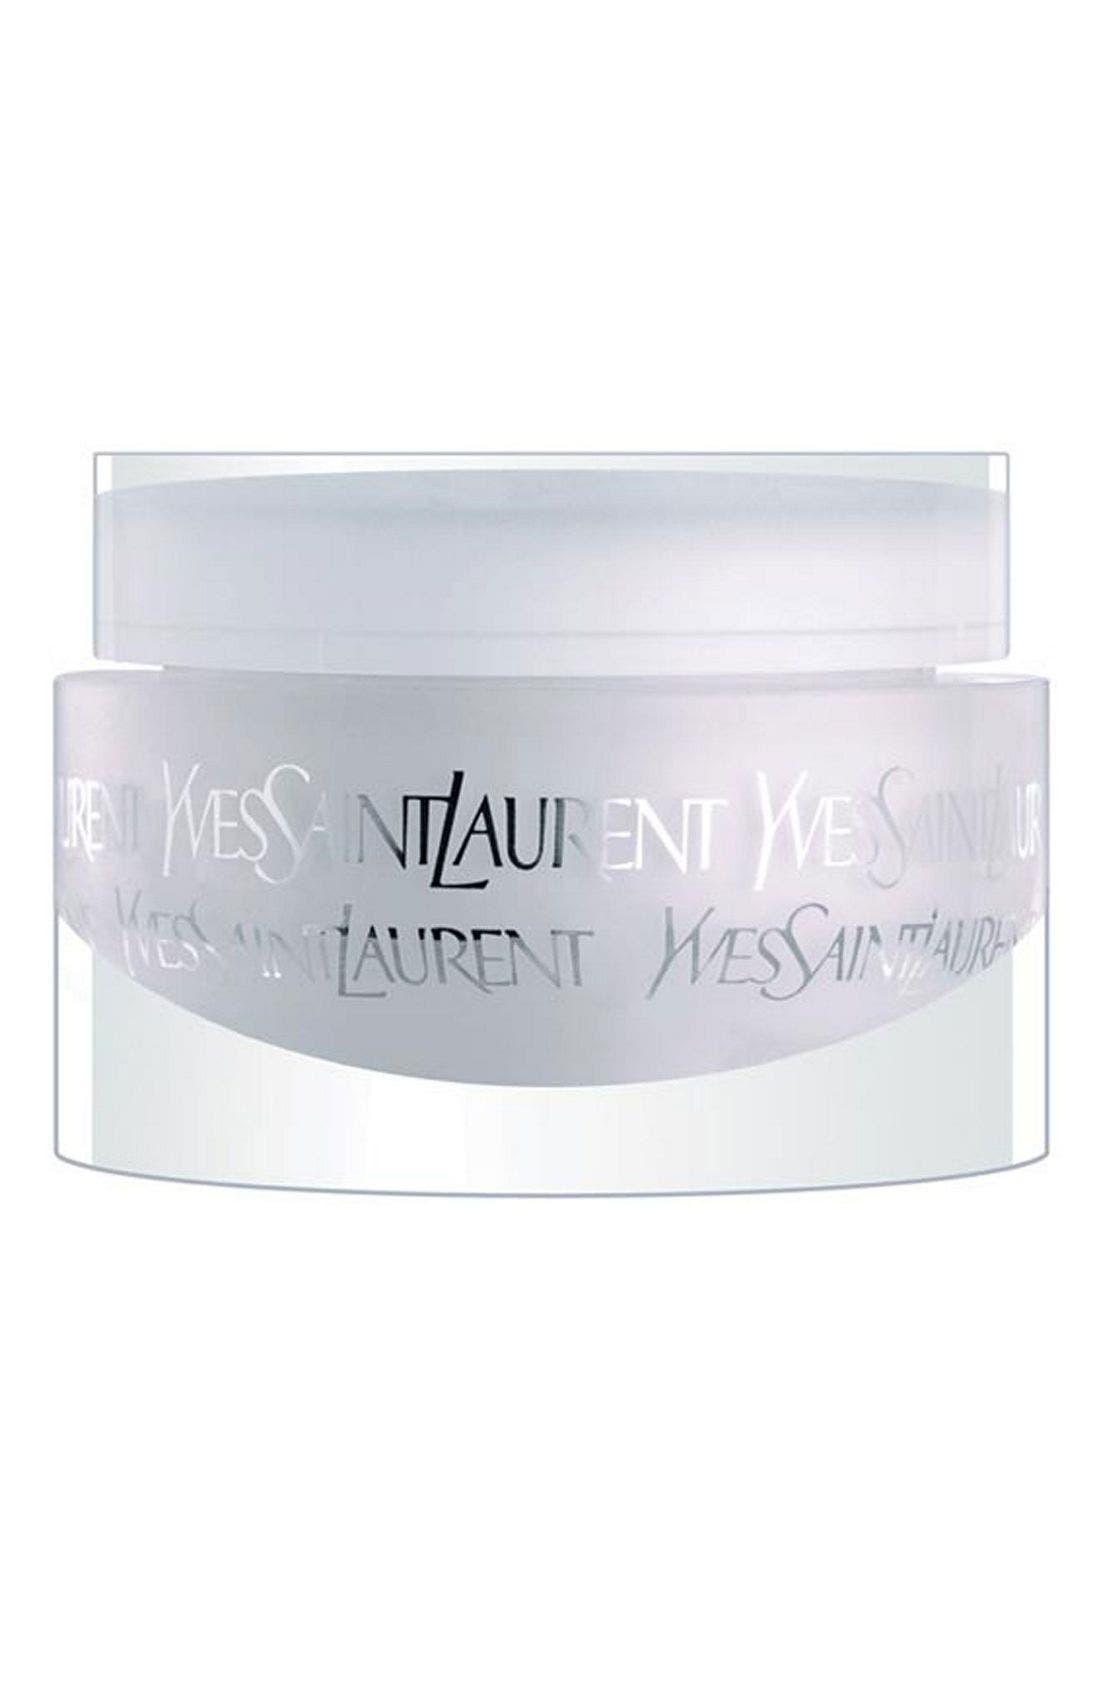 'Temps Majeur' Intense Skin Supplement,                             Main thumbnail 1, color,                             000